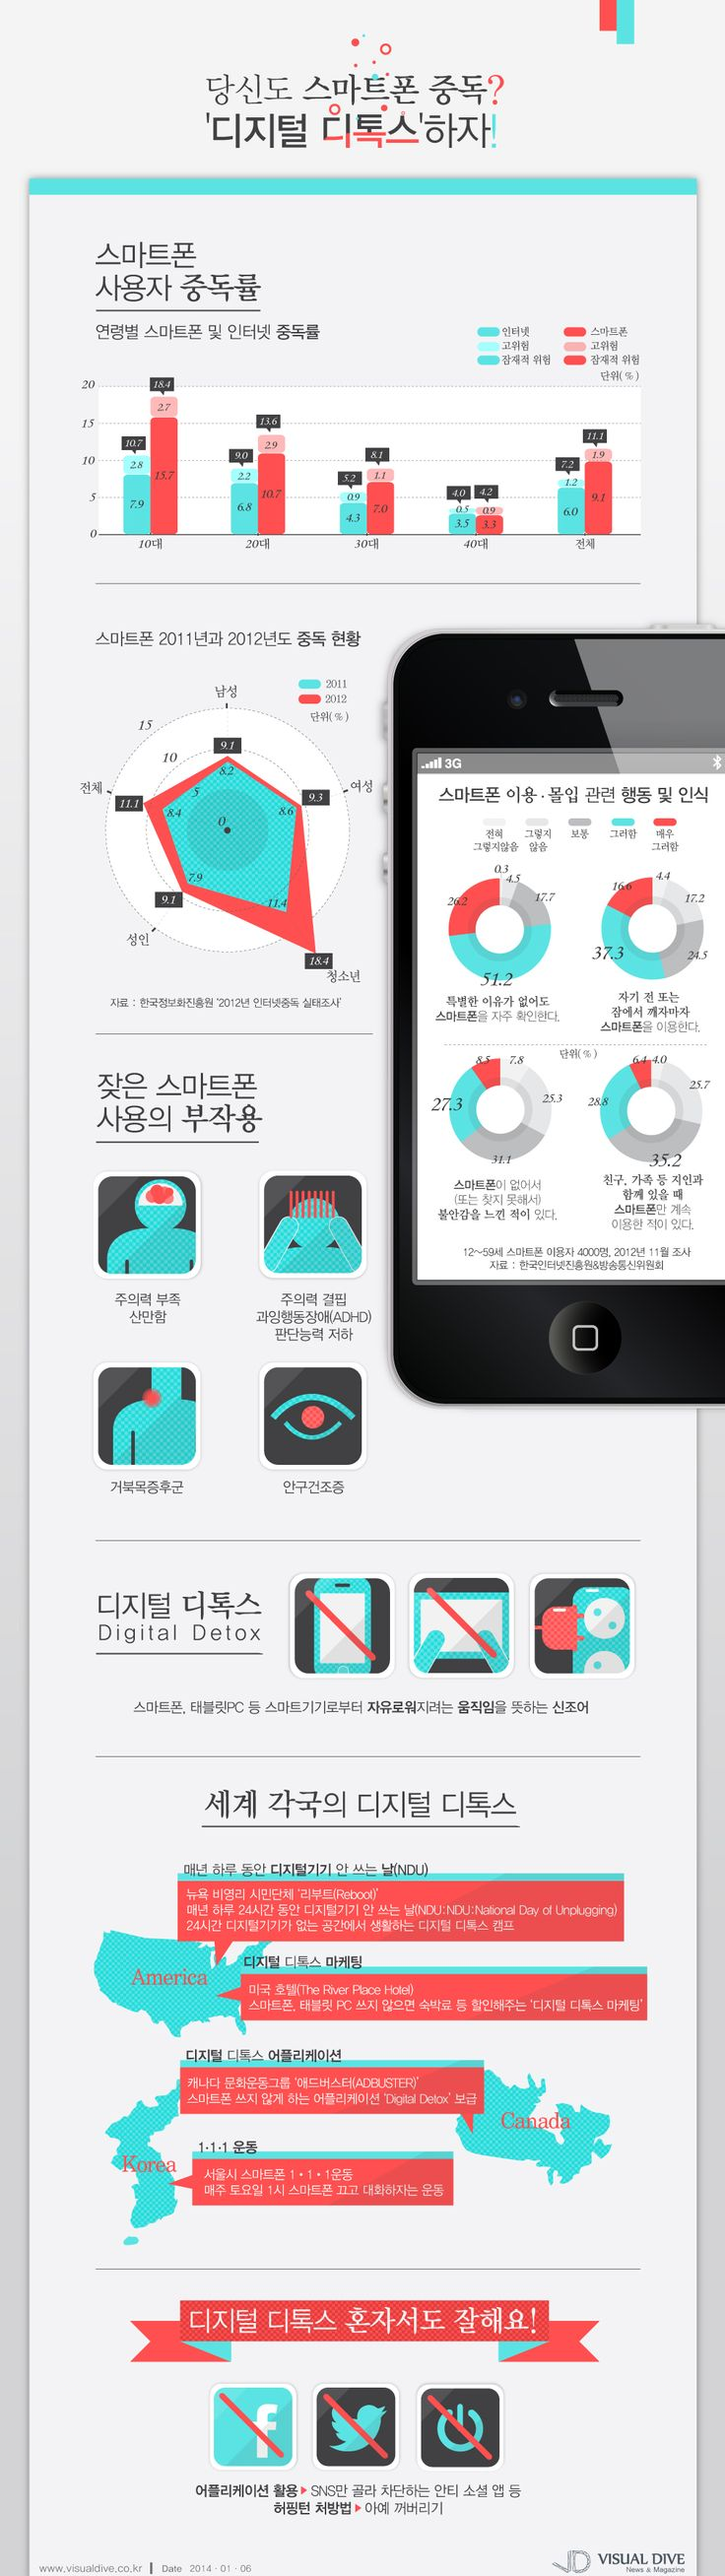 [Infographic] 스마트폰 중독에서 해방! '디지털 디톡스'에 관한 인포그래픽